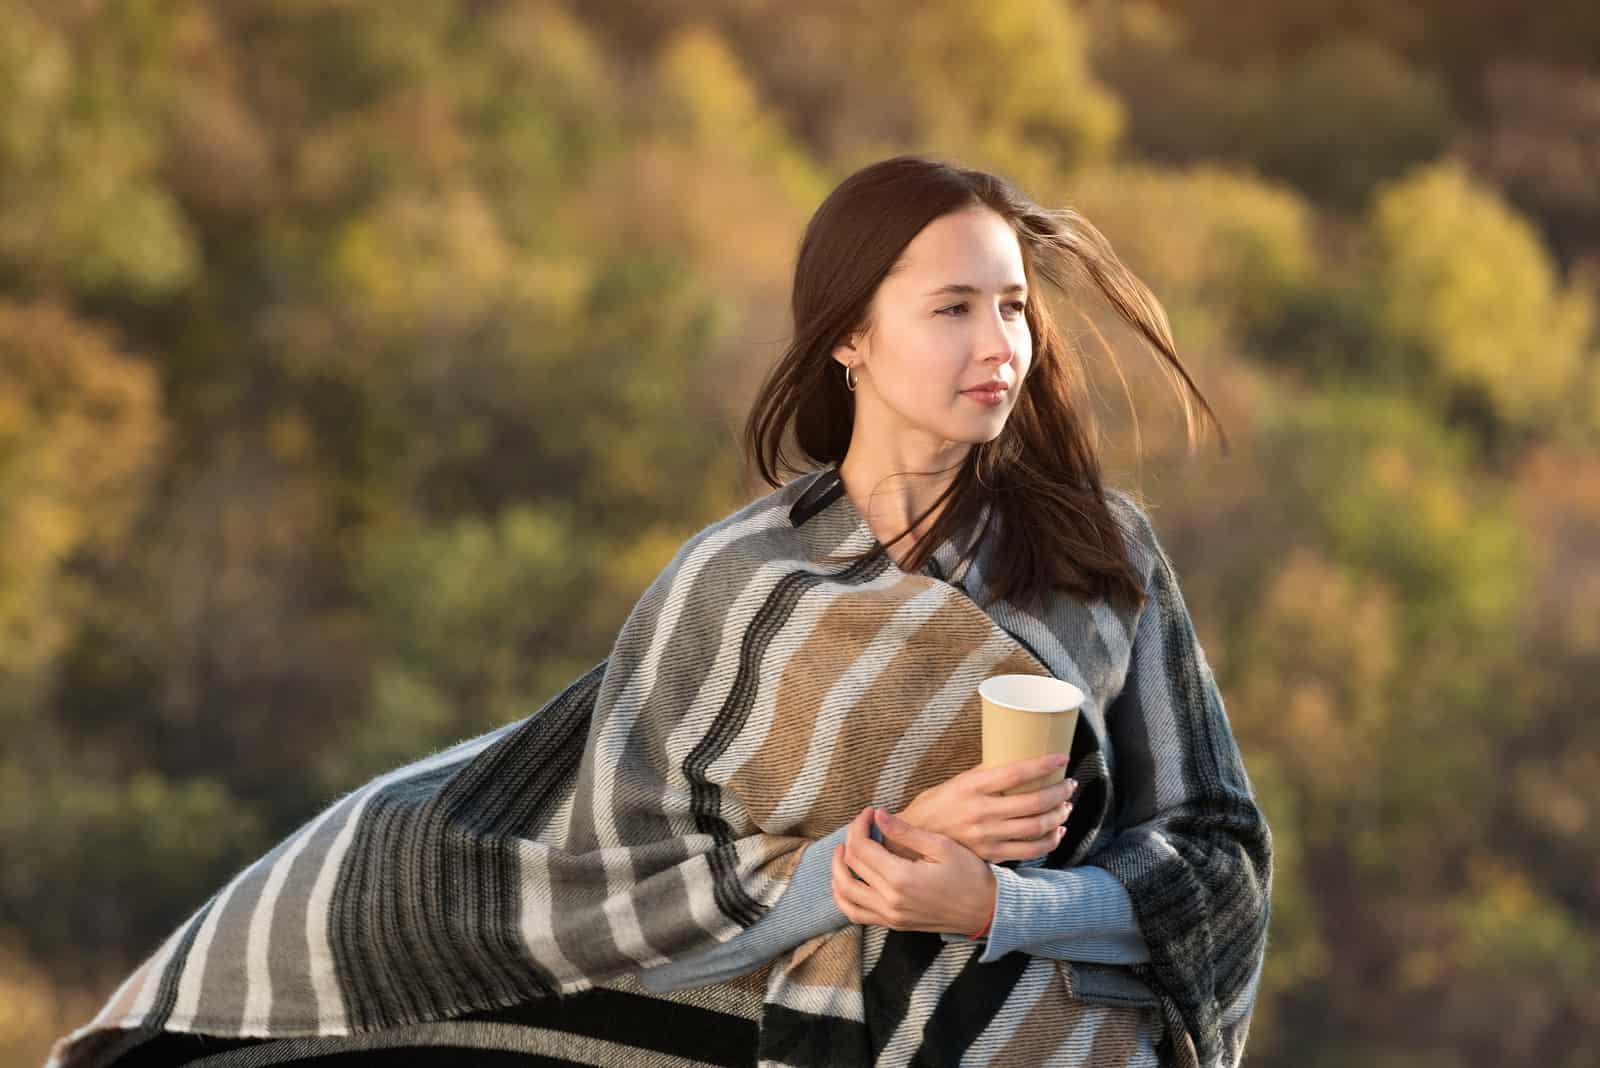 Frau in eine Decke gewickelt